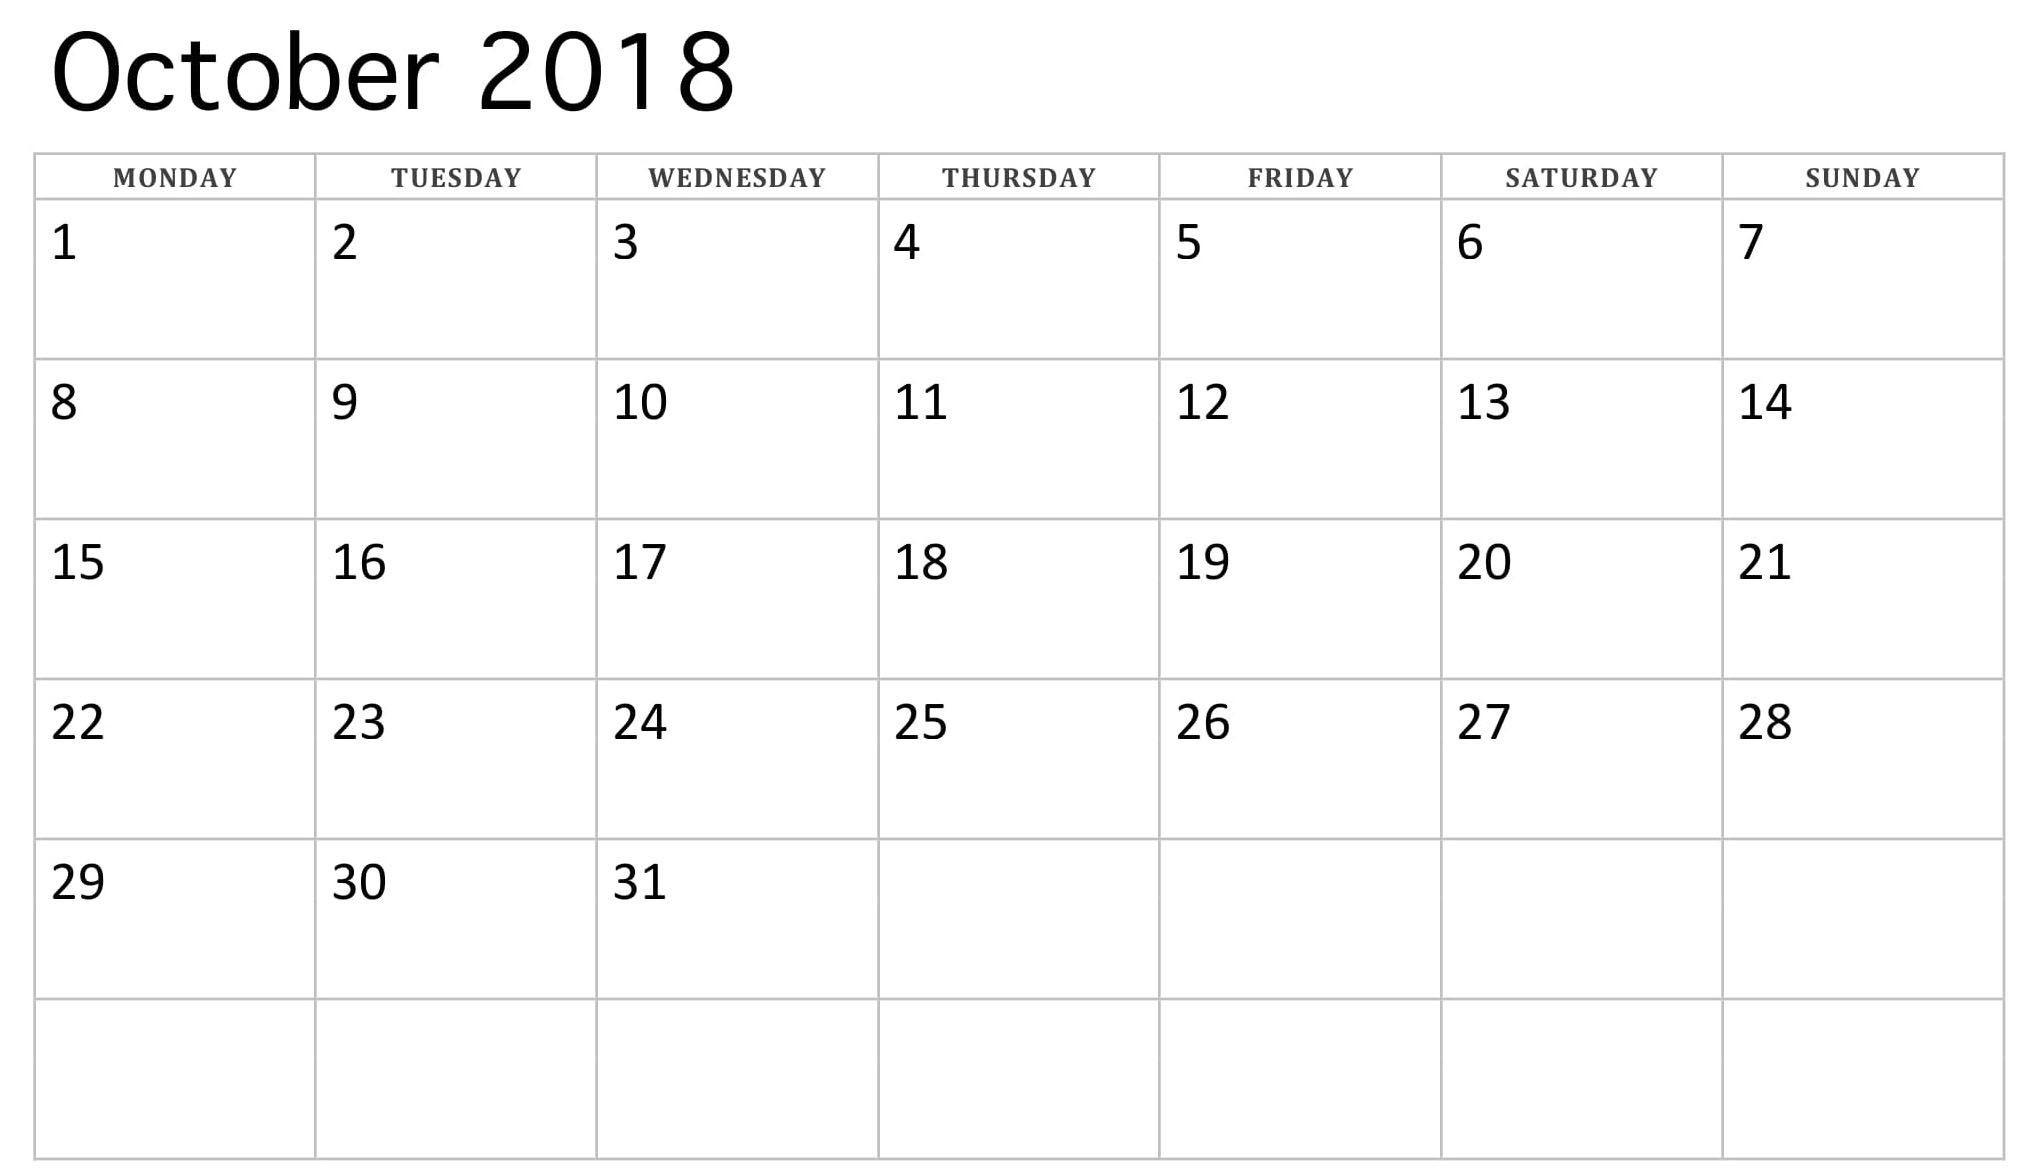 2018 October Monday Starting Calendar | 2018 Calendars-Monthly Calendar Starts On Monday